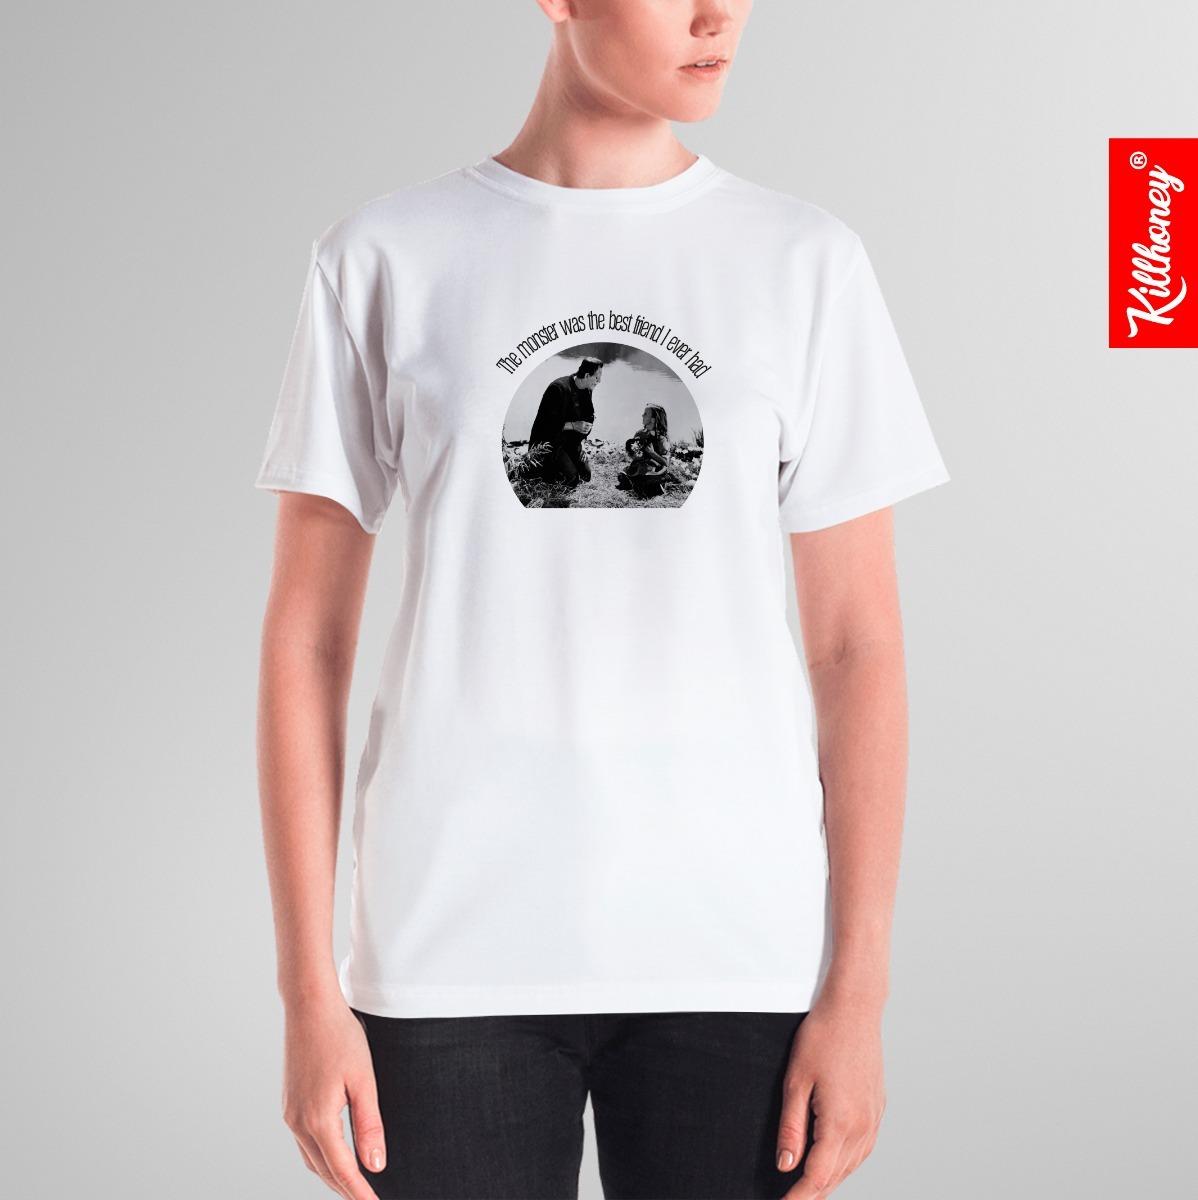 507febb19 Camiseta Frankenstein - The Monster Was The Best Friend - R  39